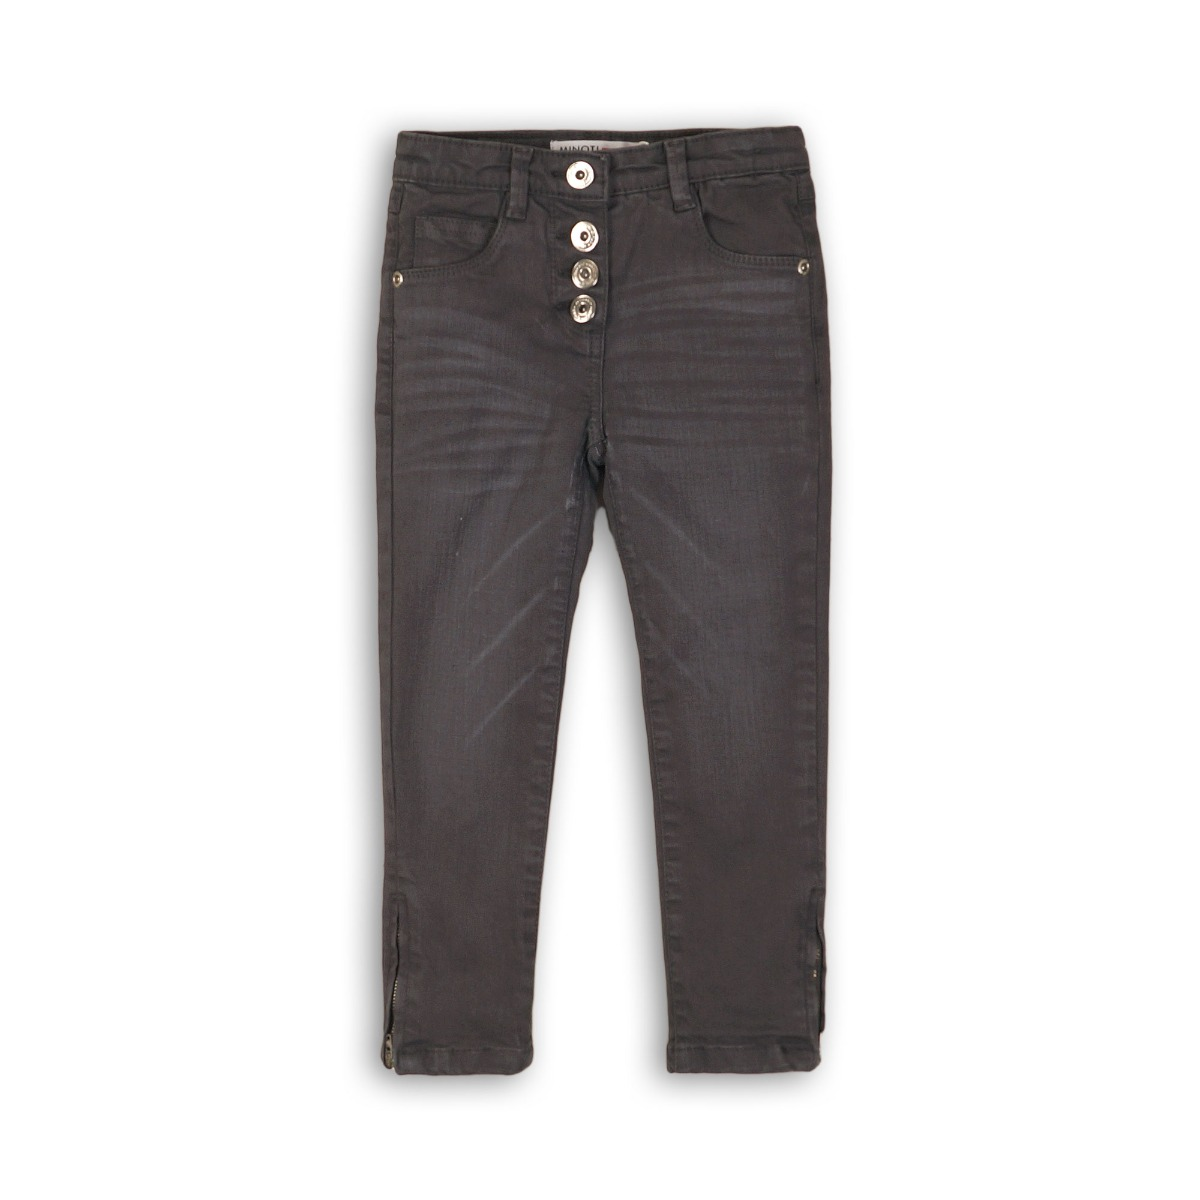 Pantaloni lungi cu buzunare si inchidere cu nasturi Minoti Wistful imagine